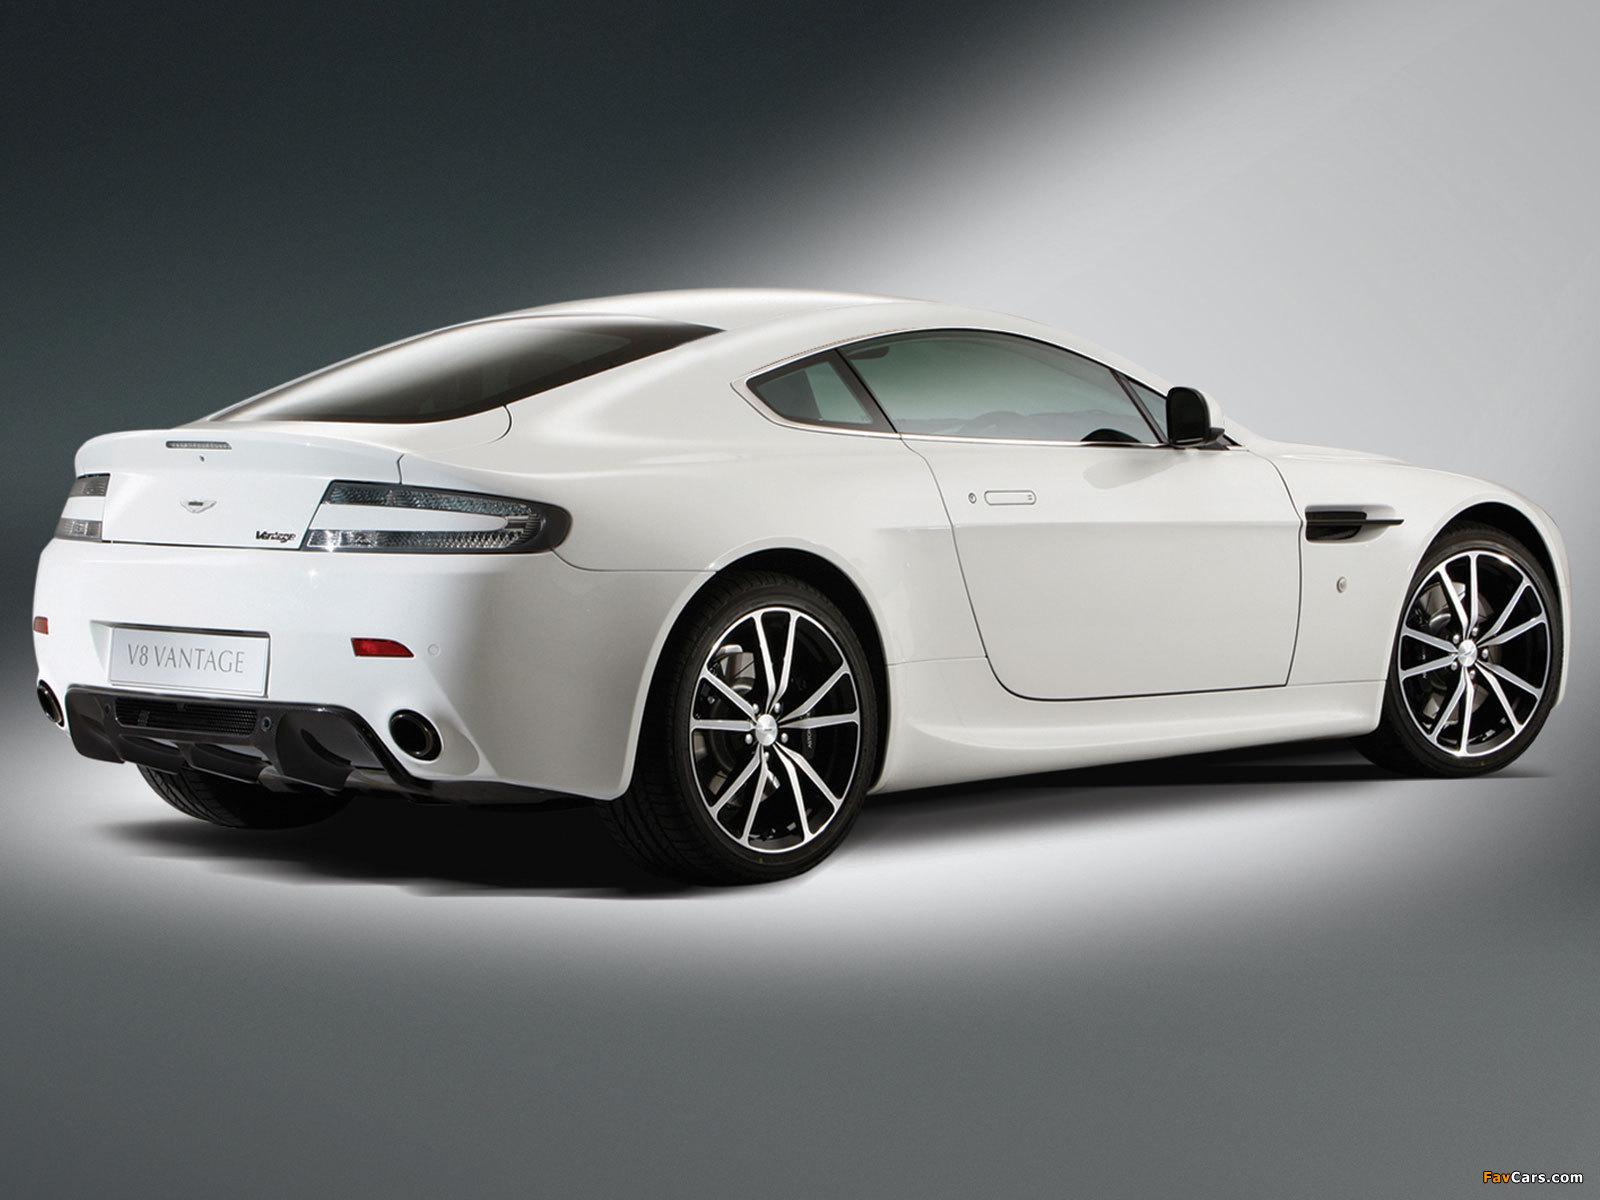 Aston Martin V8 Vantage N420 2010 Wallpapers 1600x1200